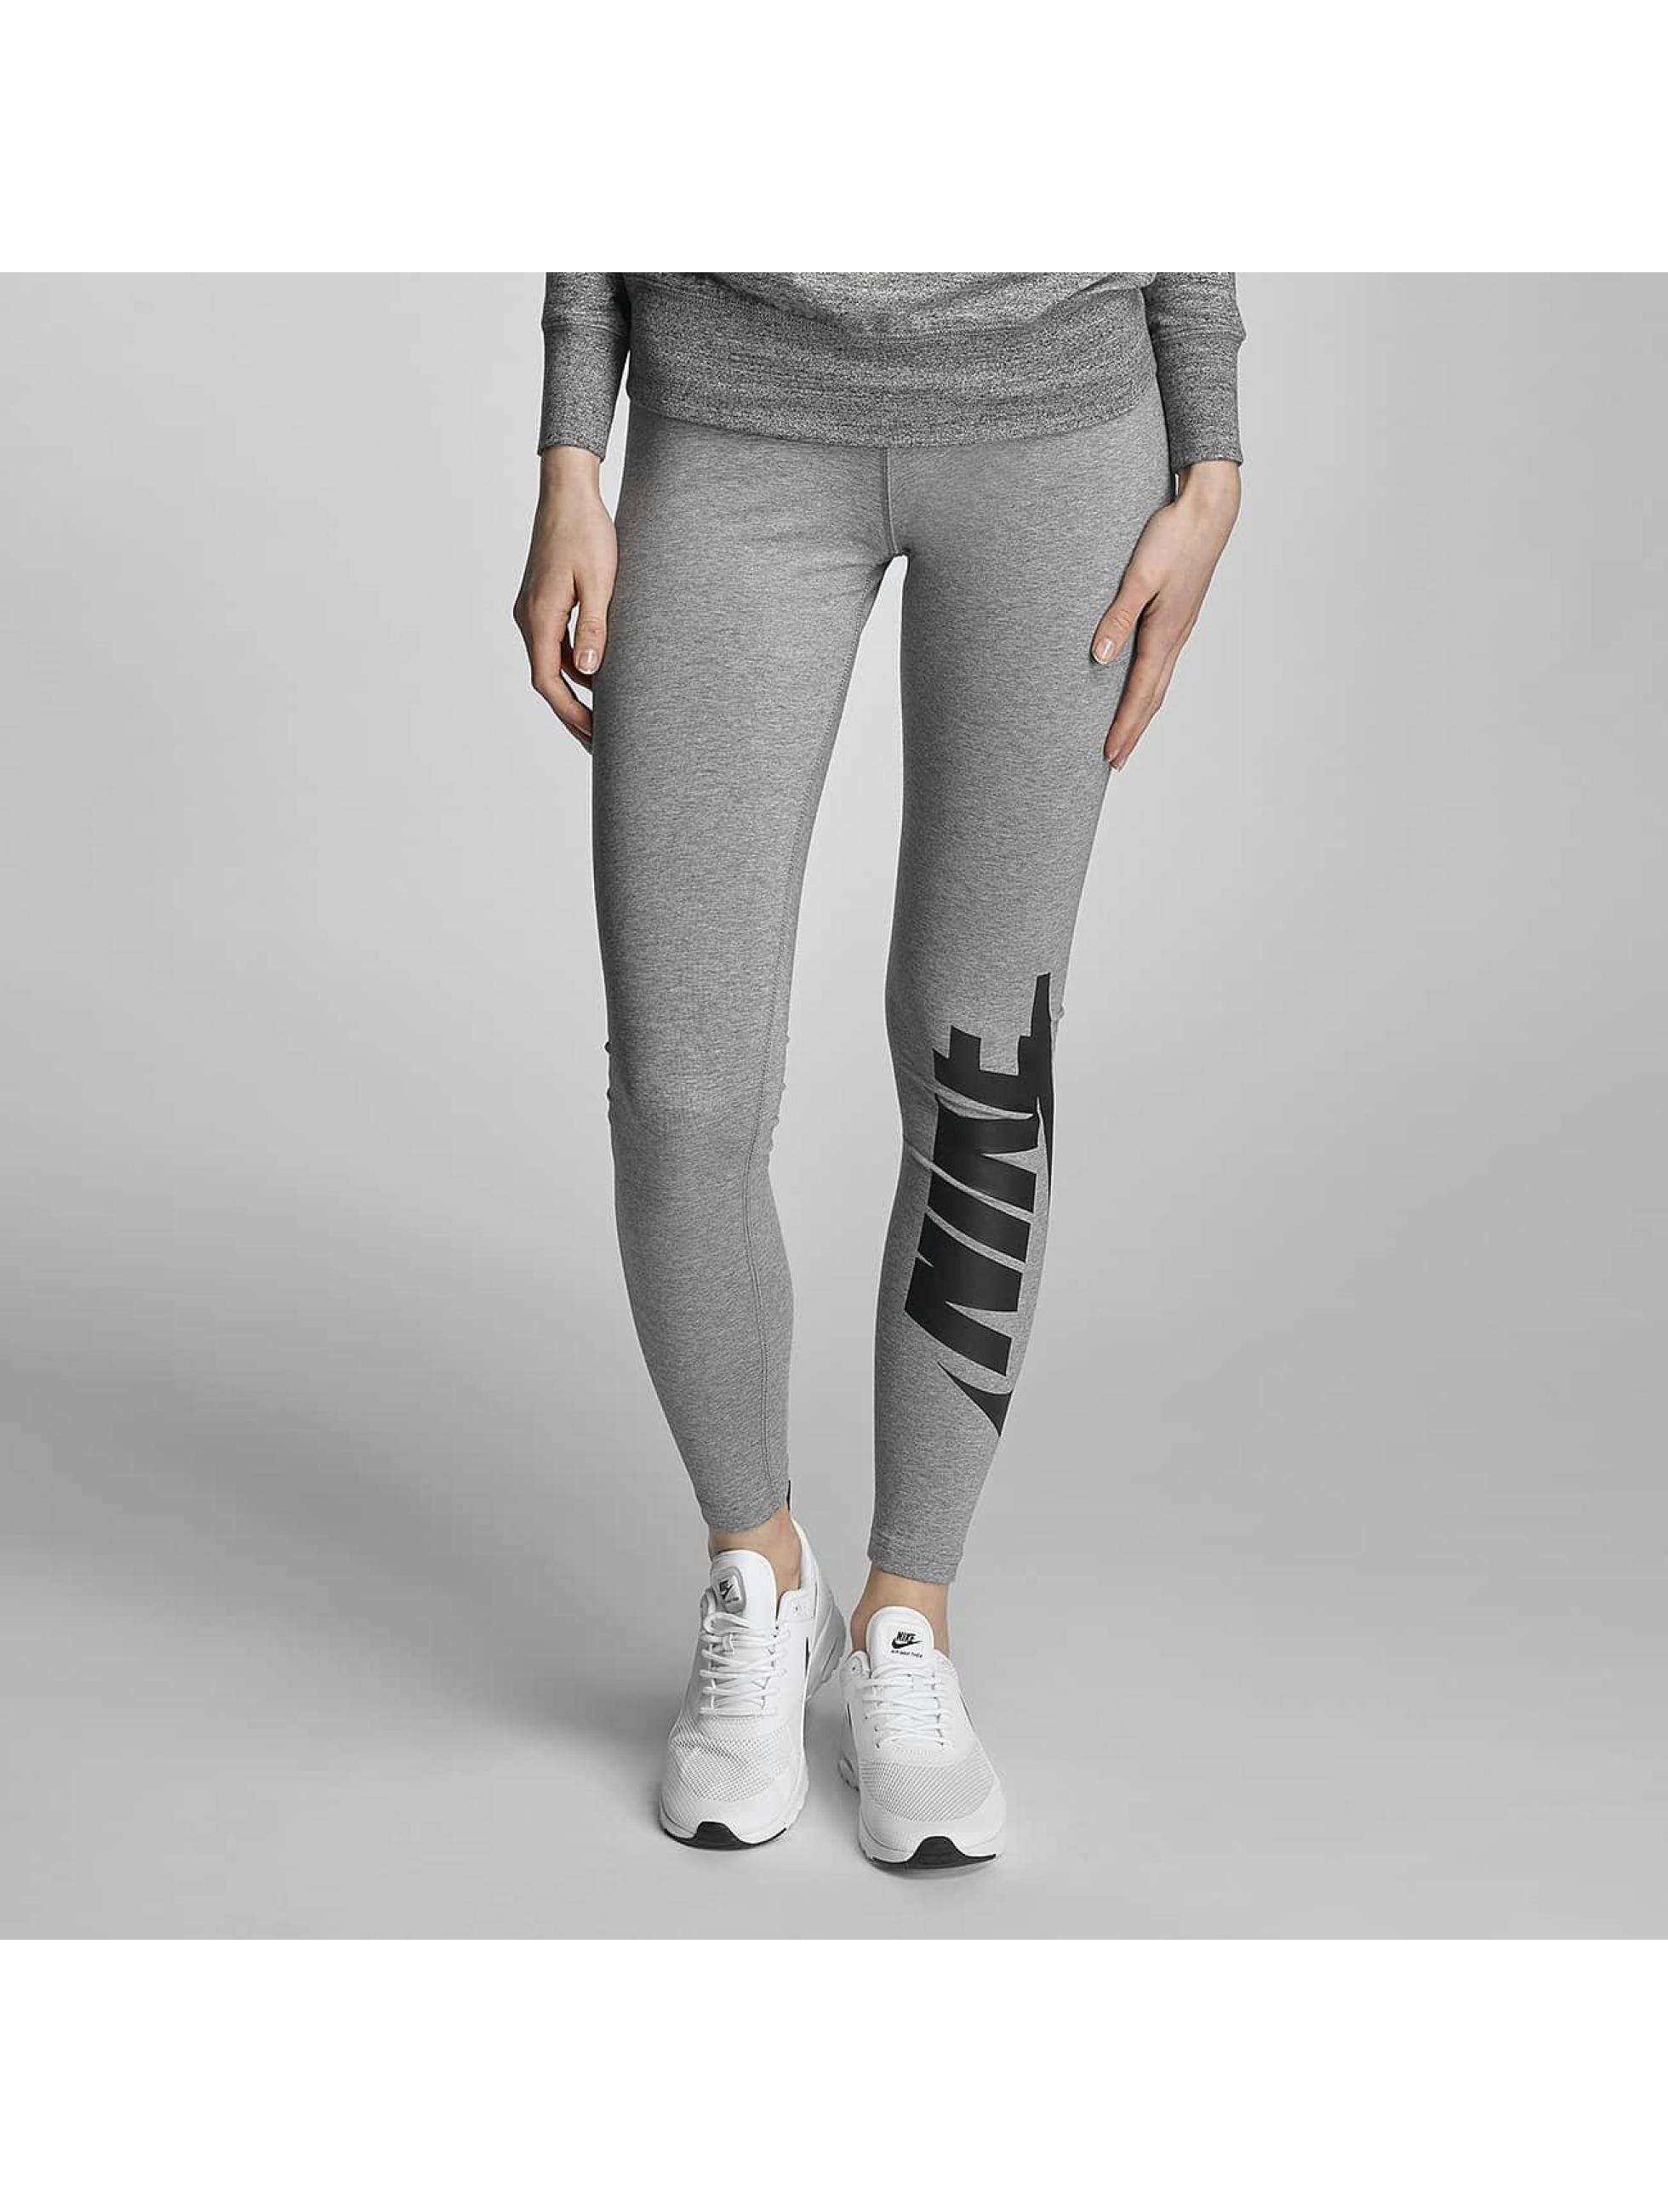 Nike Frauen Legging W NSW Irreverent in grau